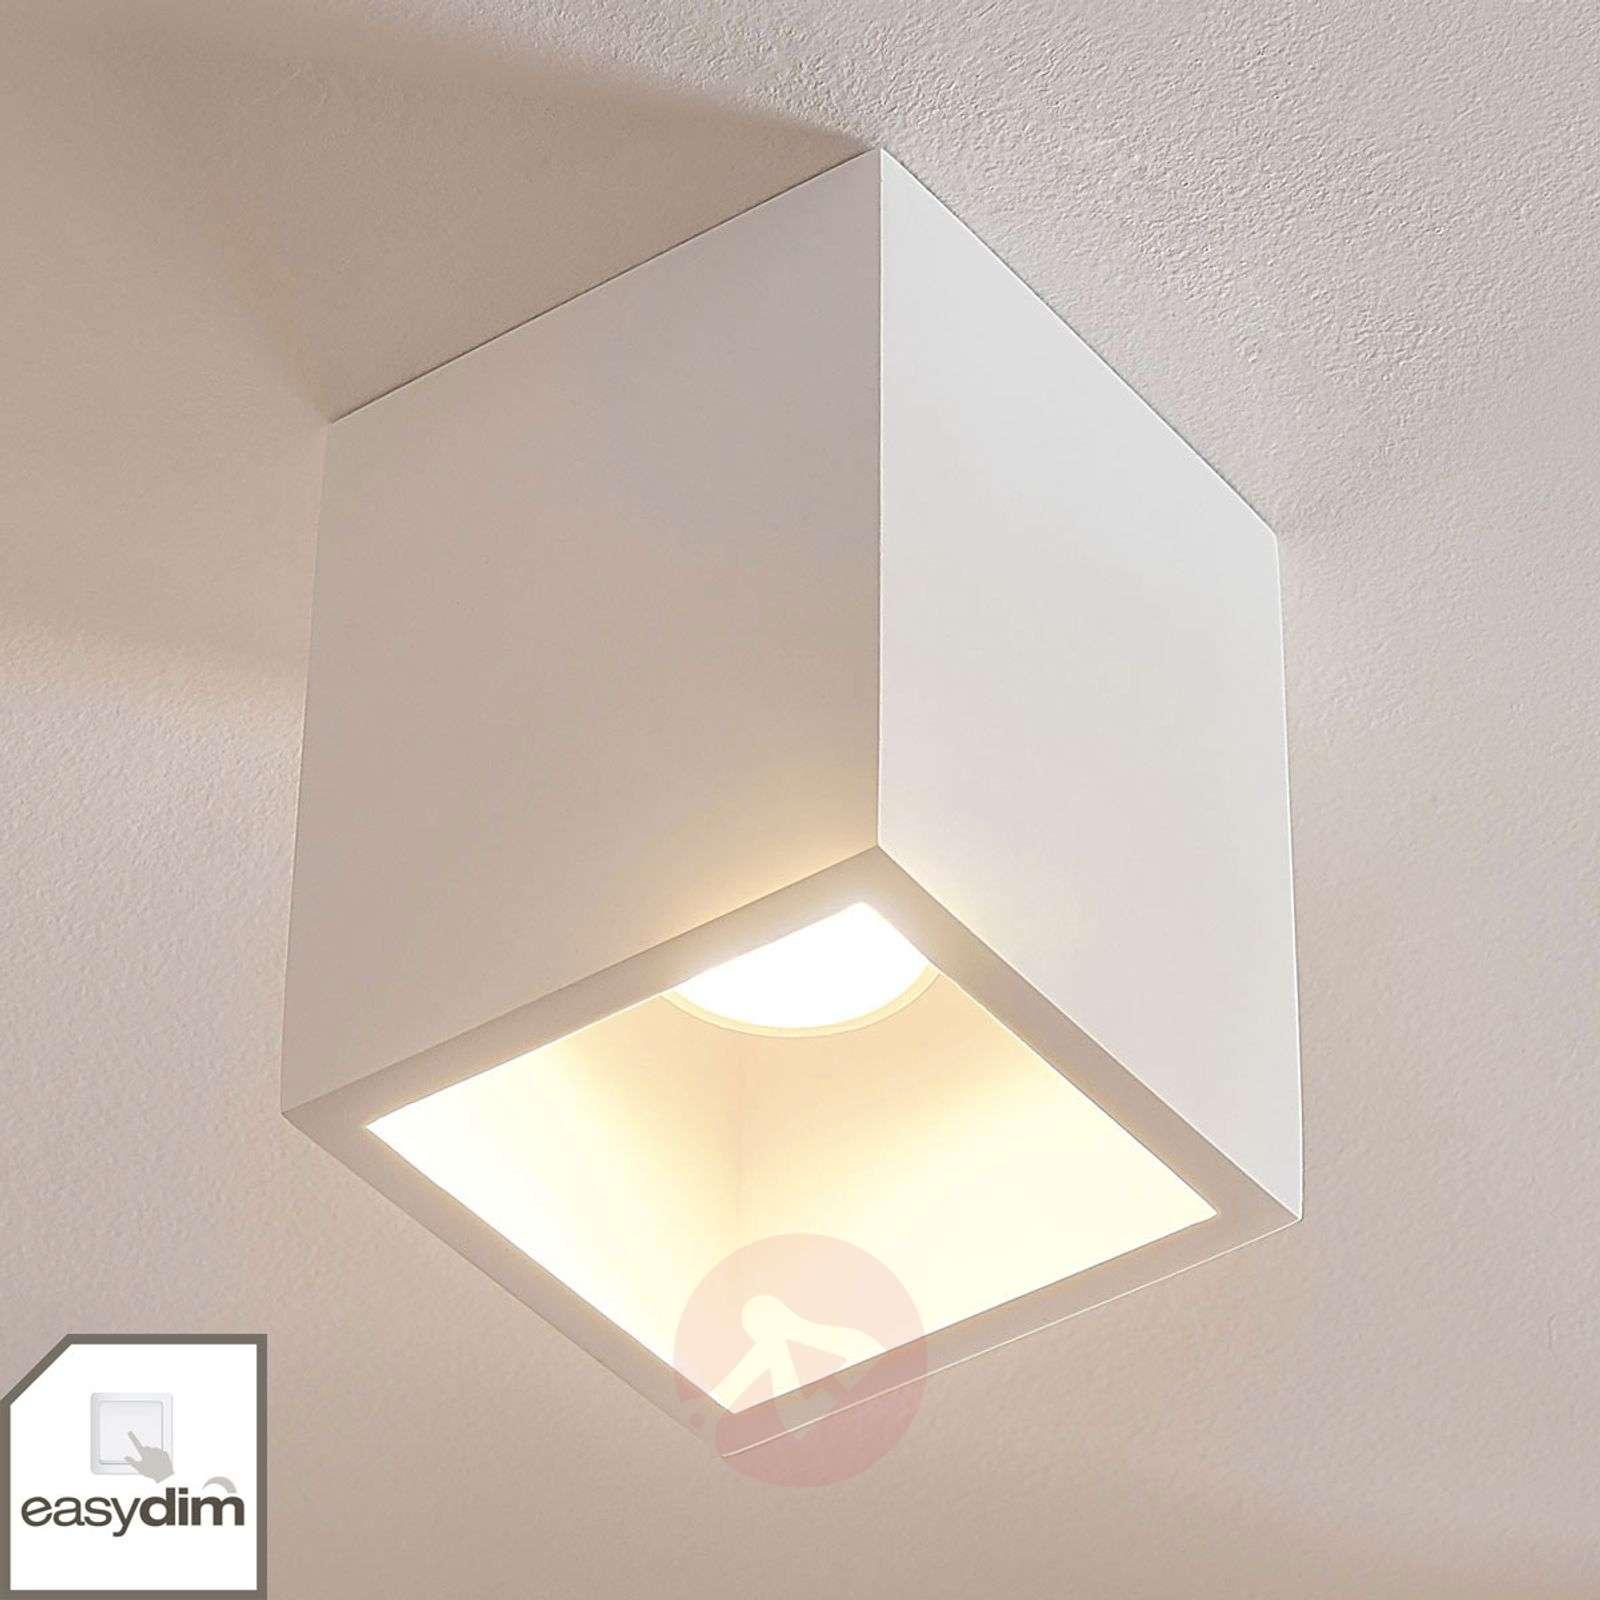 Nelikulmainen kipsi-downlight Natalie, easydim-9621355-01